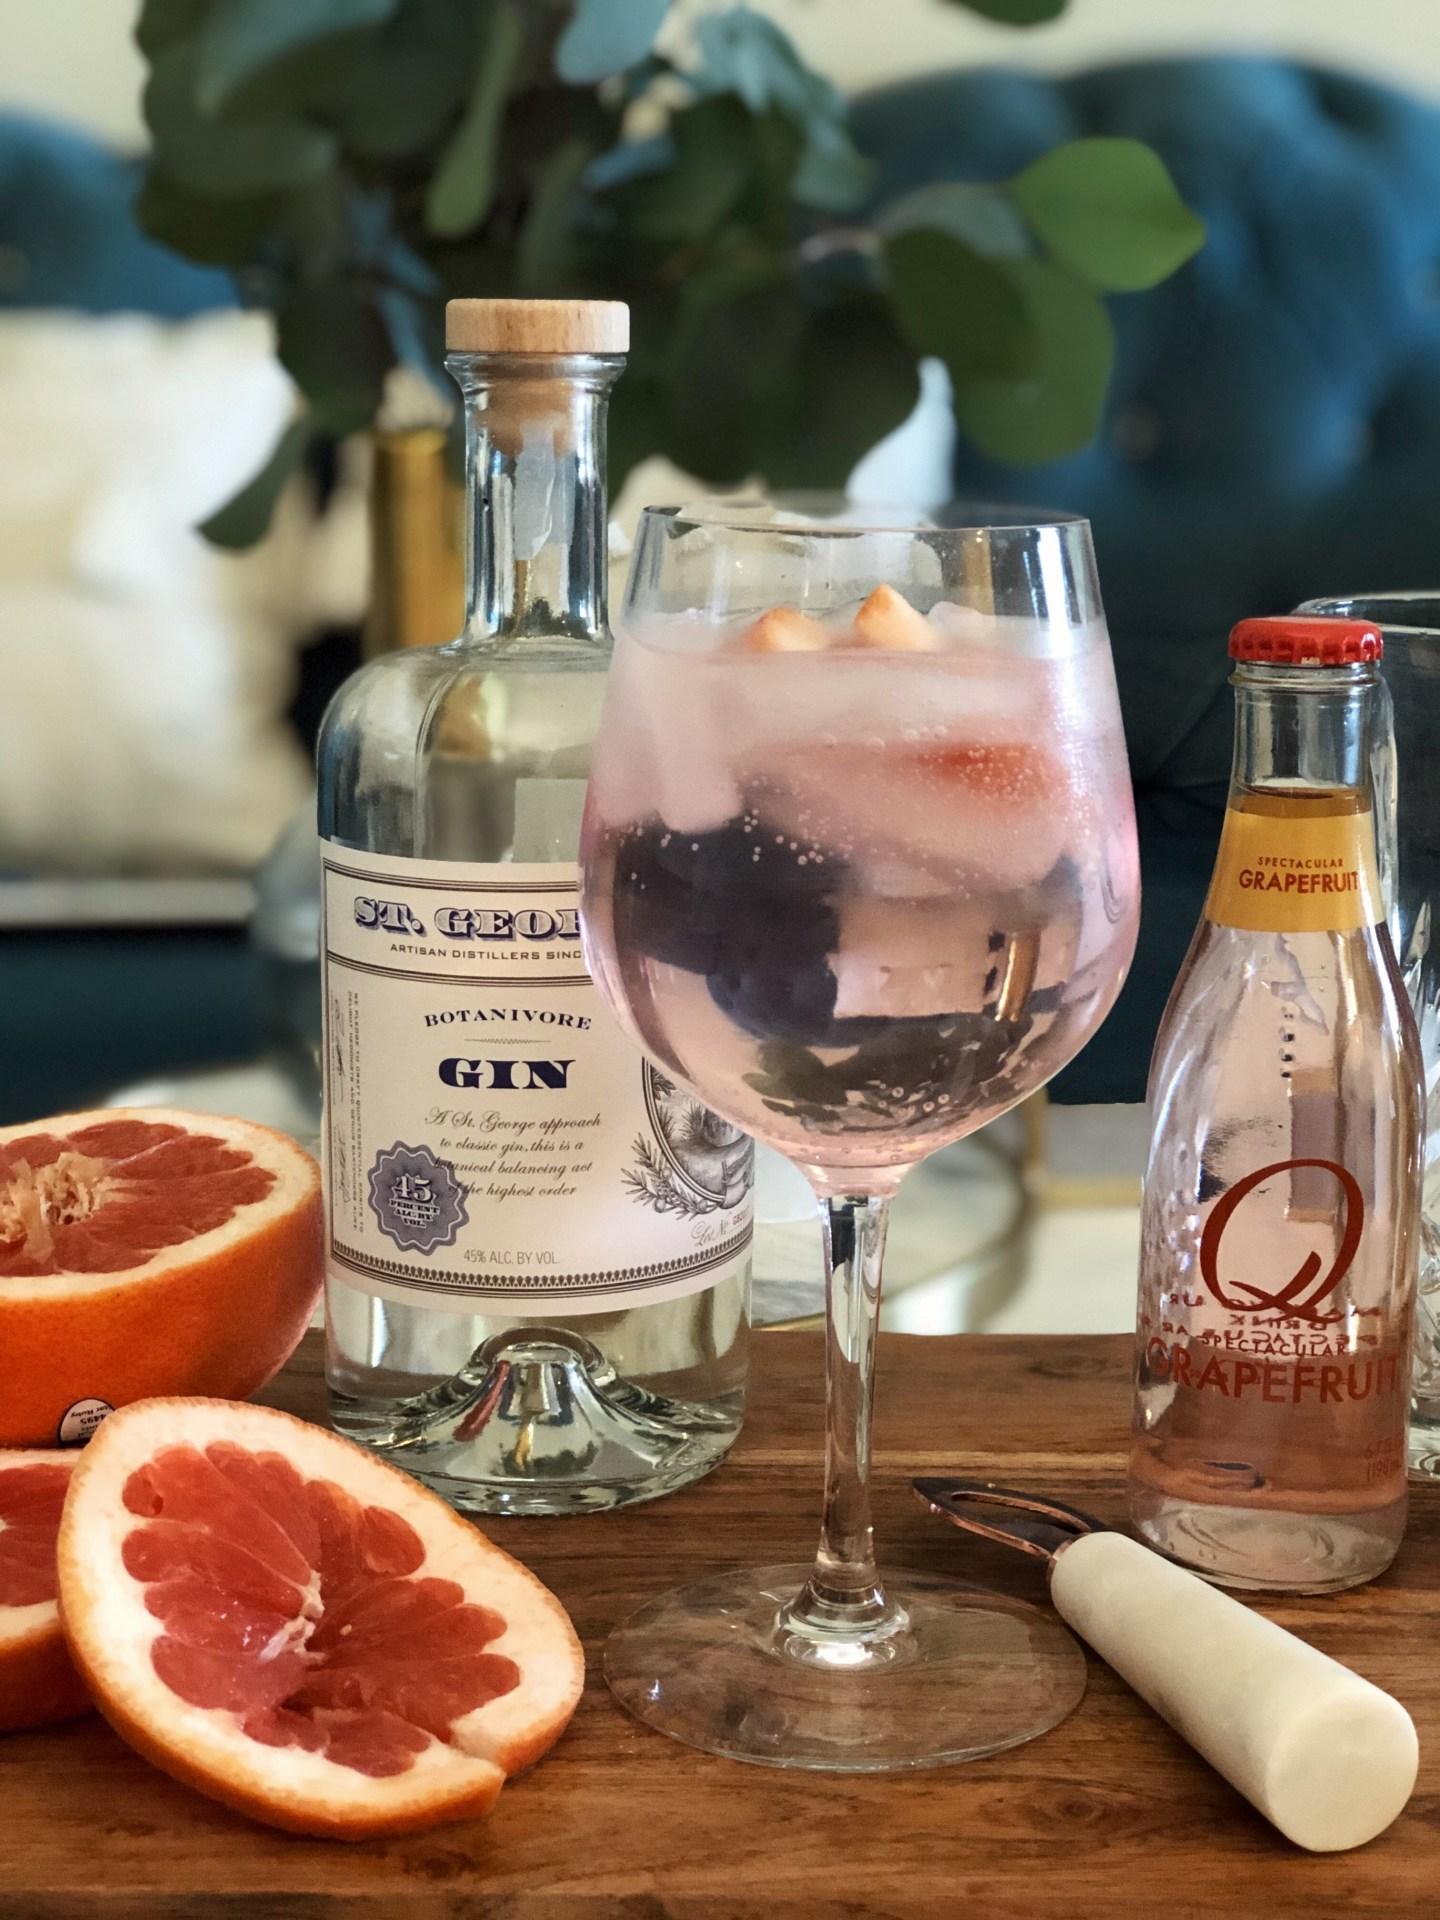 | Gin & tonic-grapefruit |